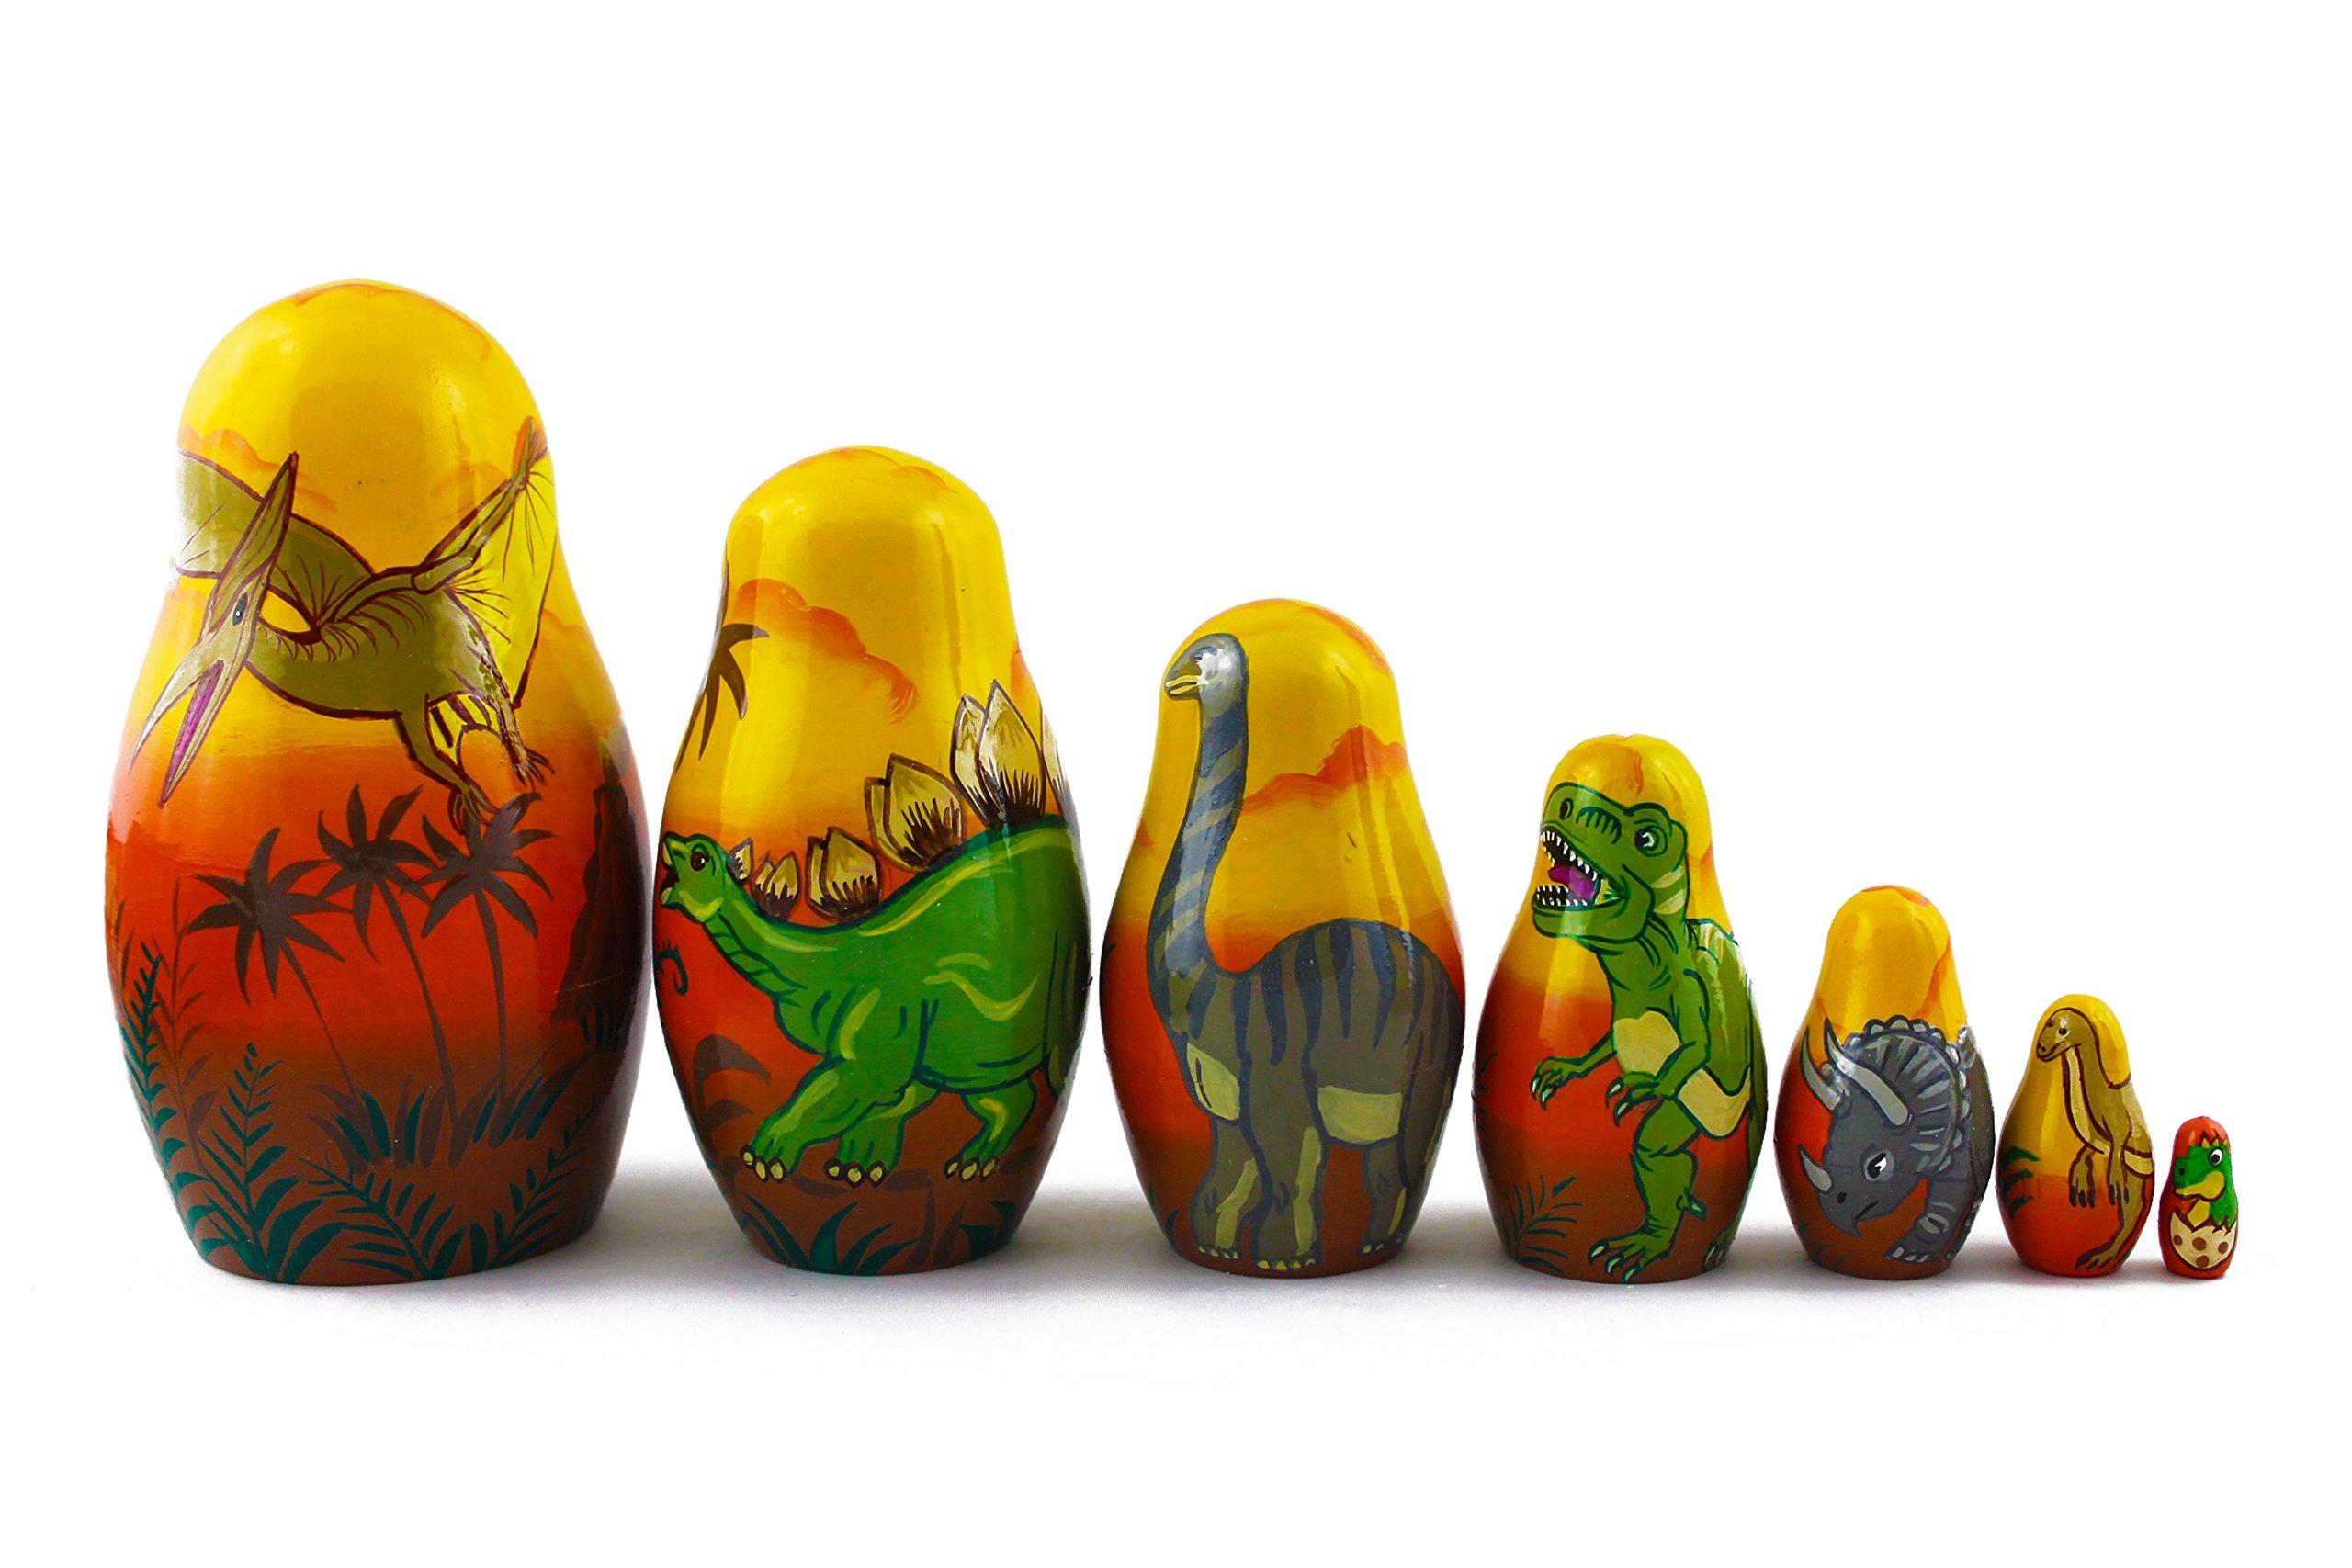 Matryoshka Babushka Russian Nesting Wooden Stacking Doll Dinosaurs 7 Pcs by MATRYOSHKA&HANDICRAFT